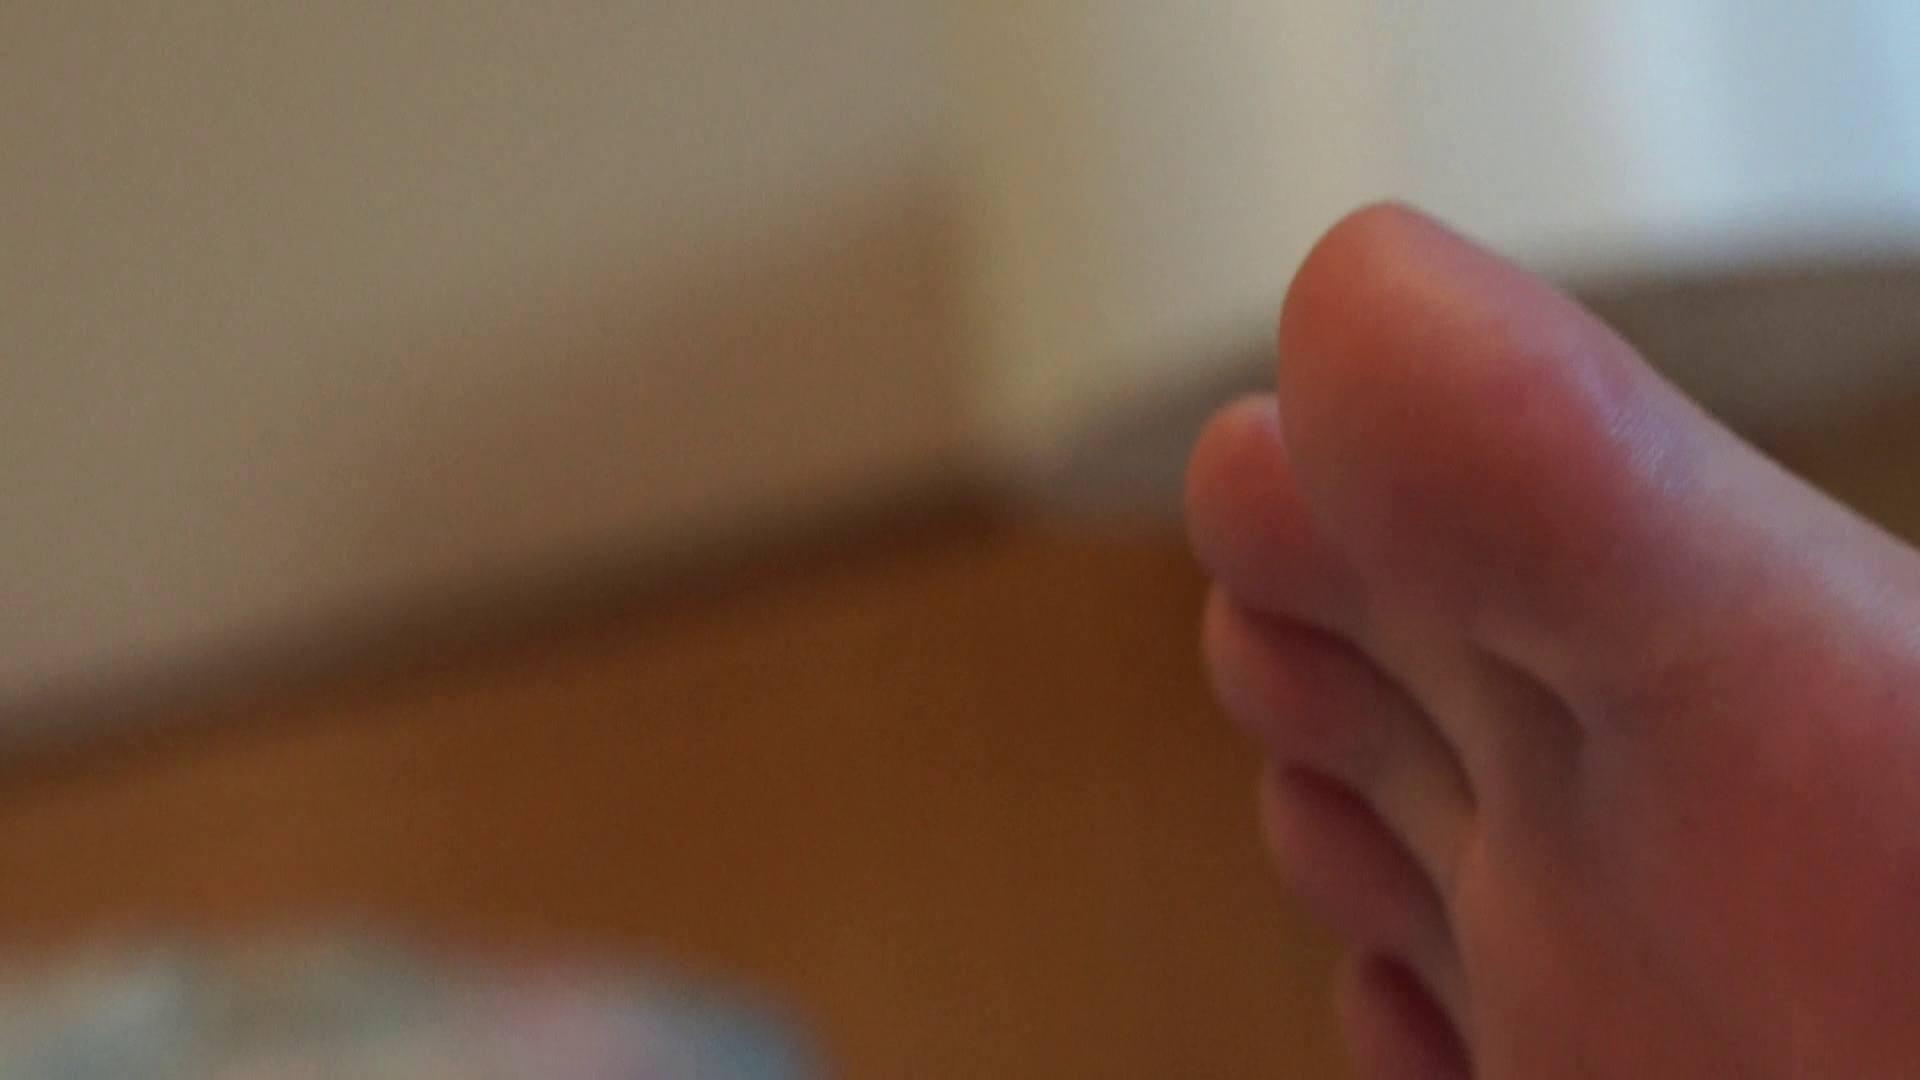 vol.15 身体をねじりながら感じる留華ちゃん クンニ アダルト動画キャプチャ 66枚 47